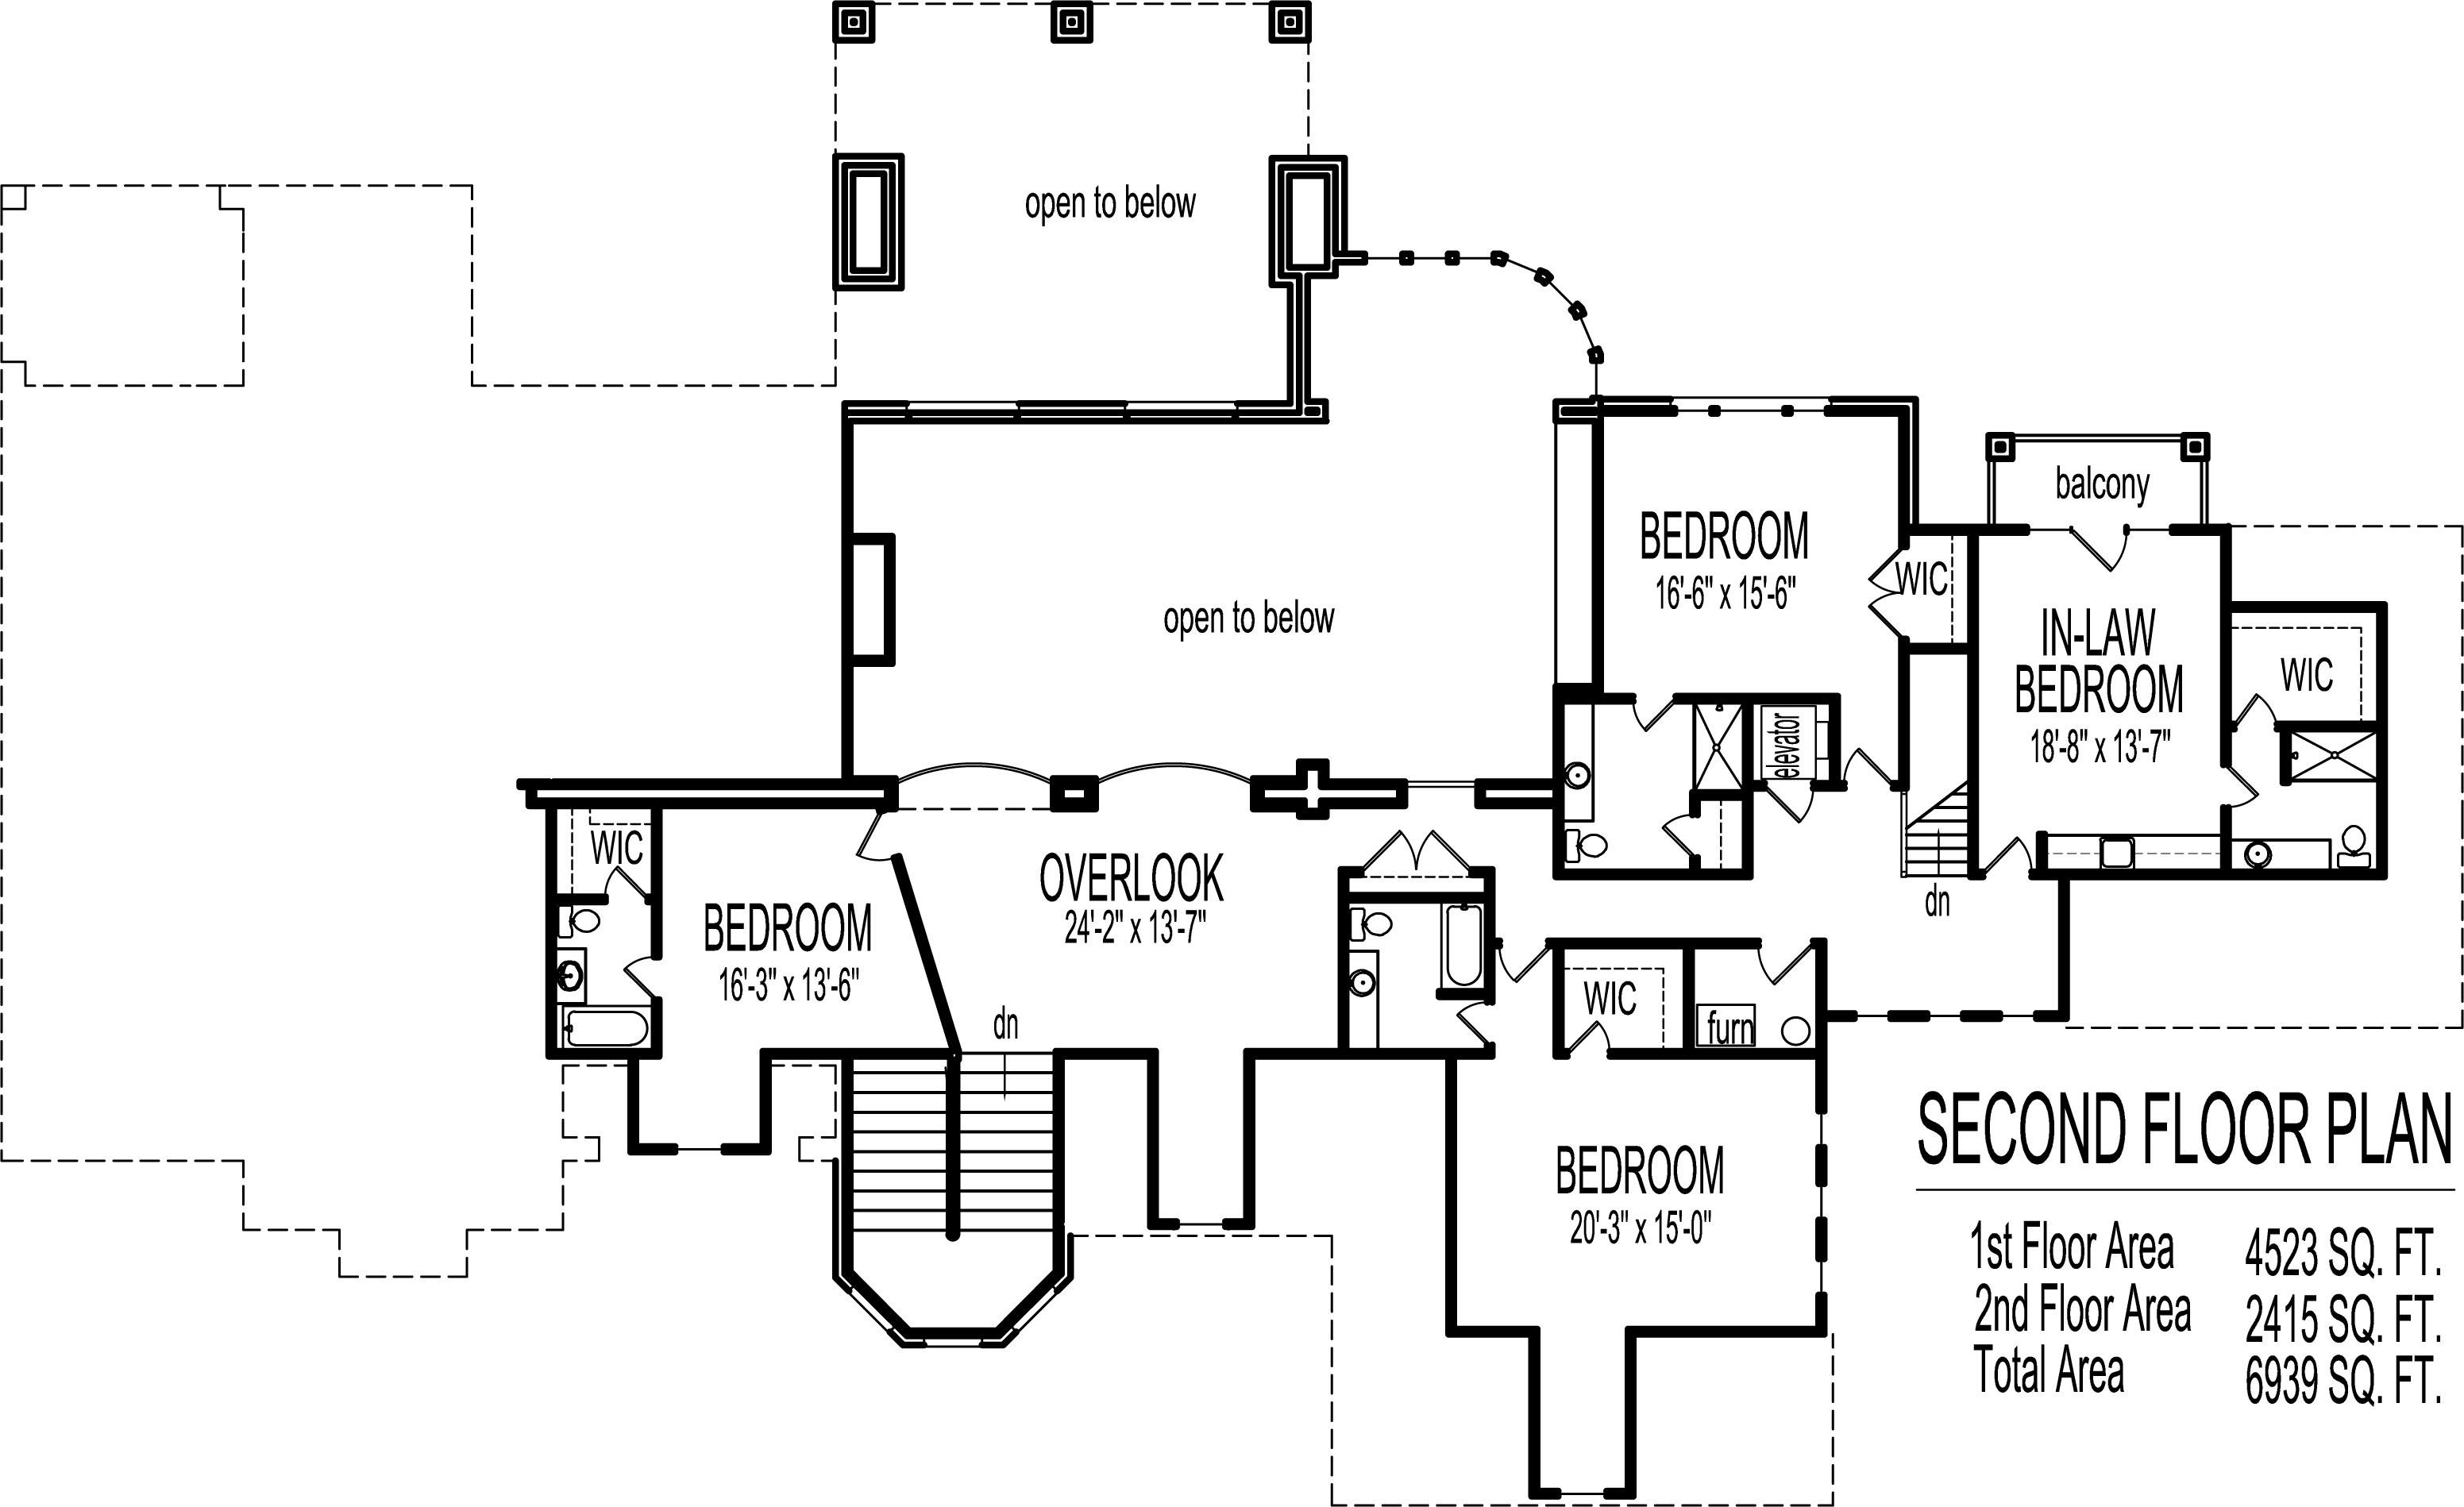 Terrific Mansion House Floor Plans Blueprints 6 Bedroom 2 Story 10000 Sq Ft Largest Home Design Picture Inspirations Pitcheantrous